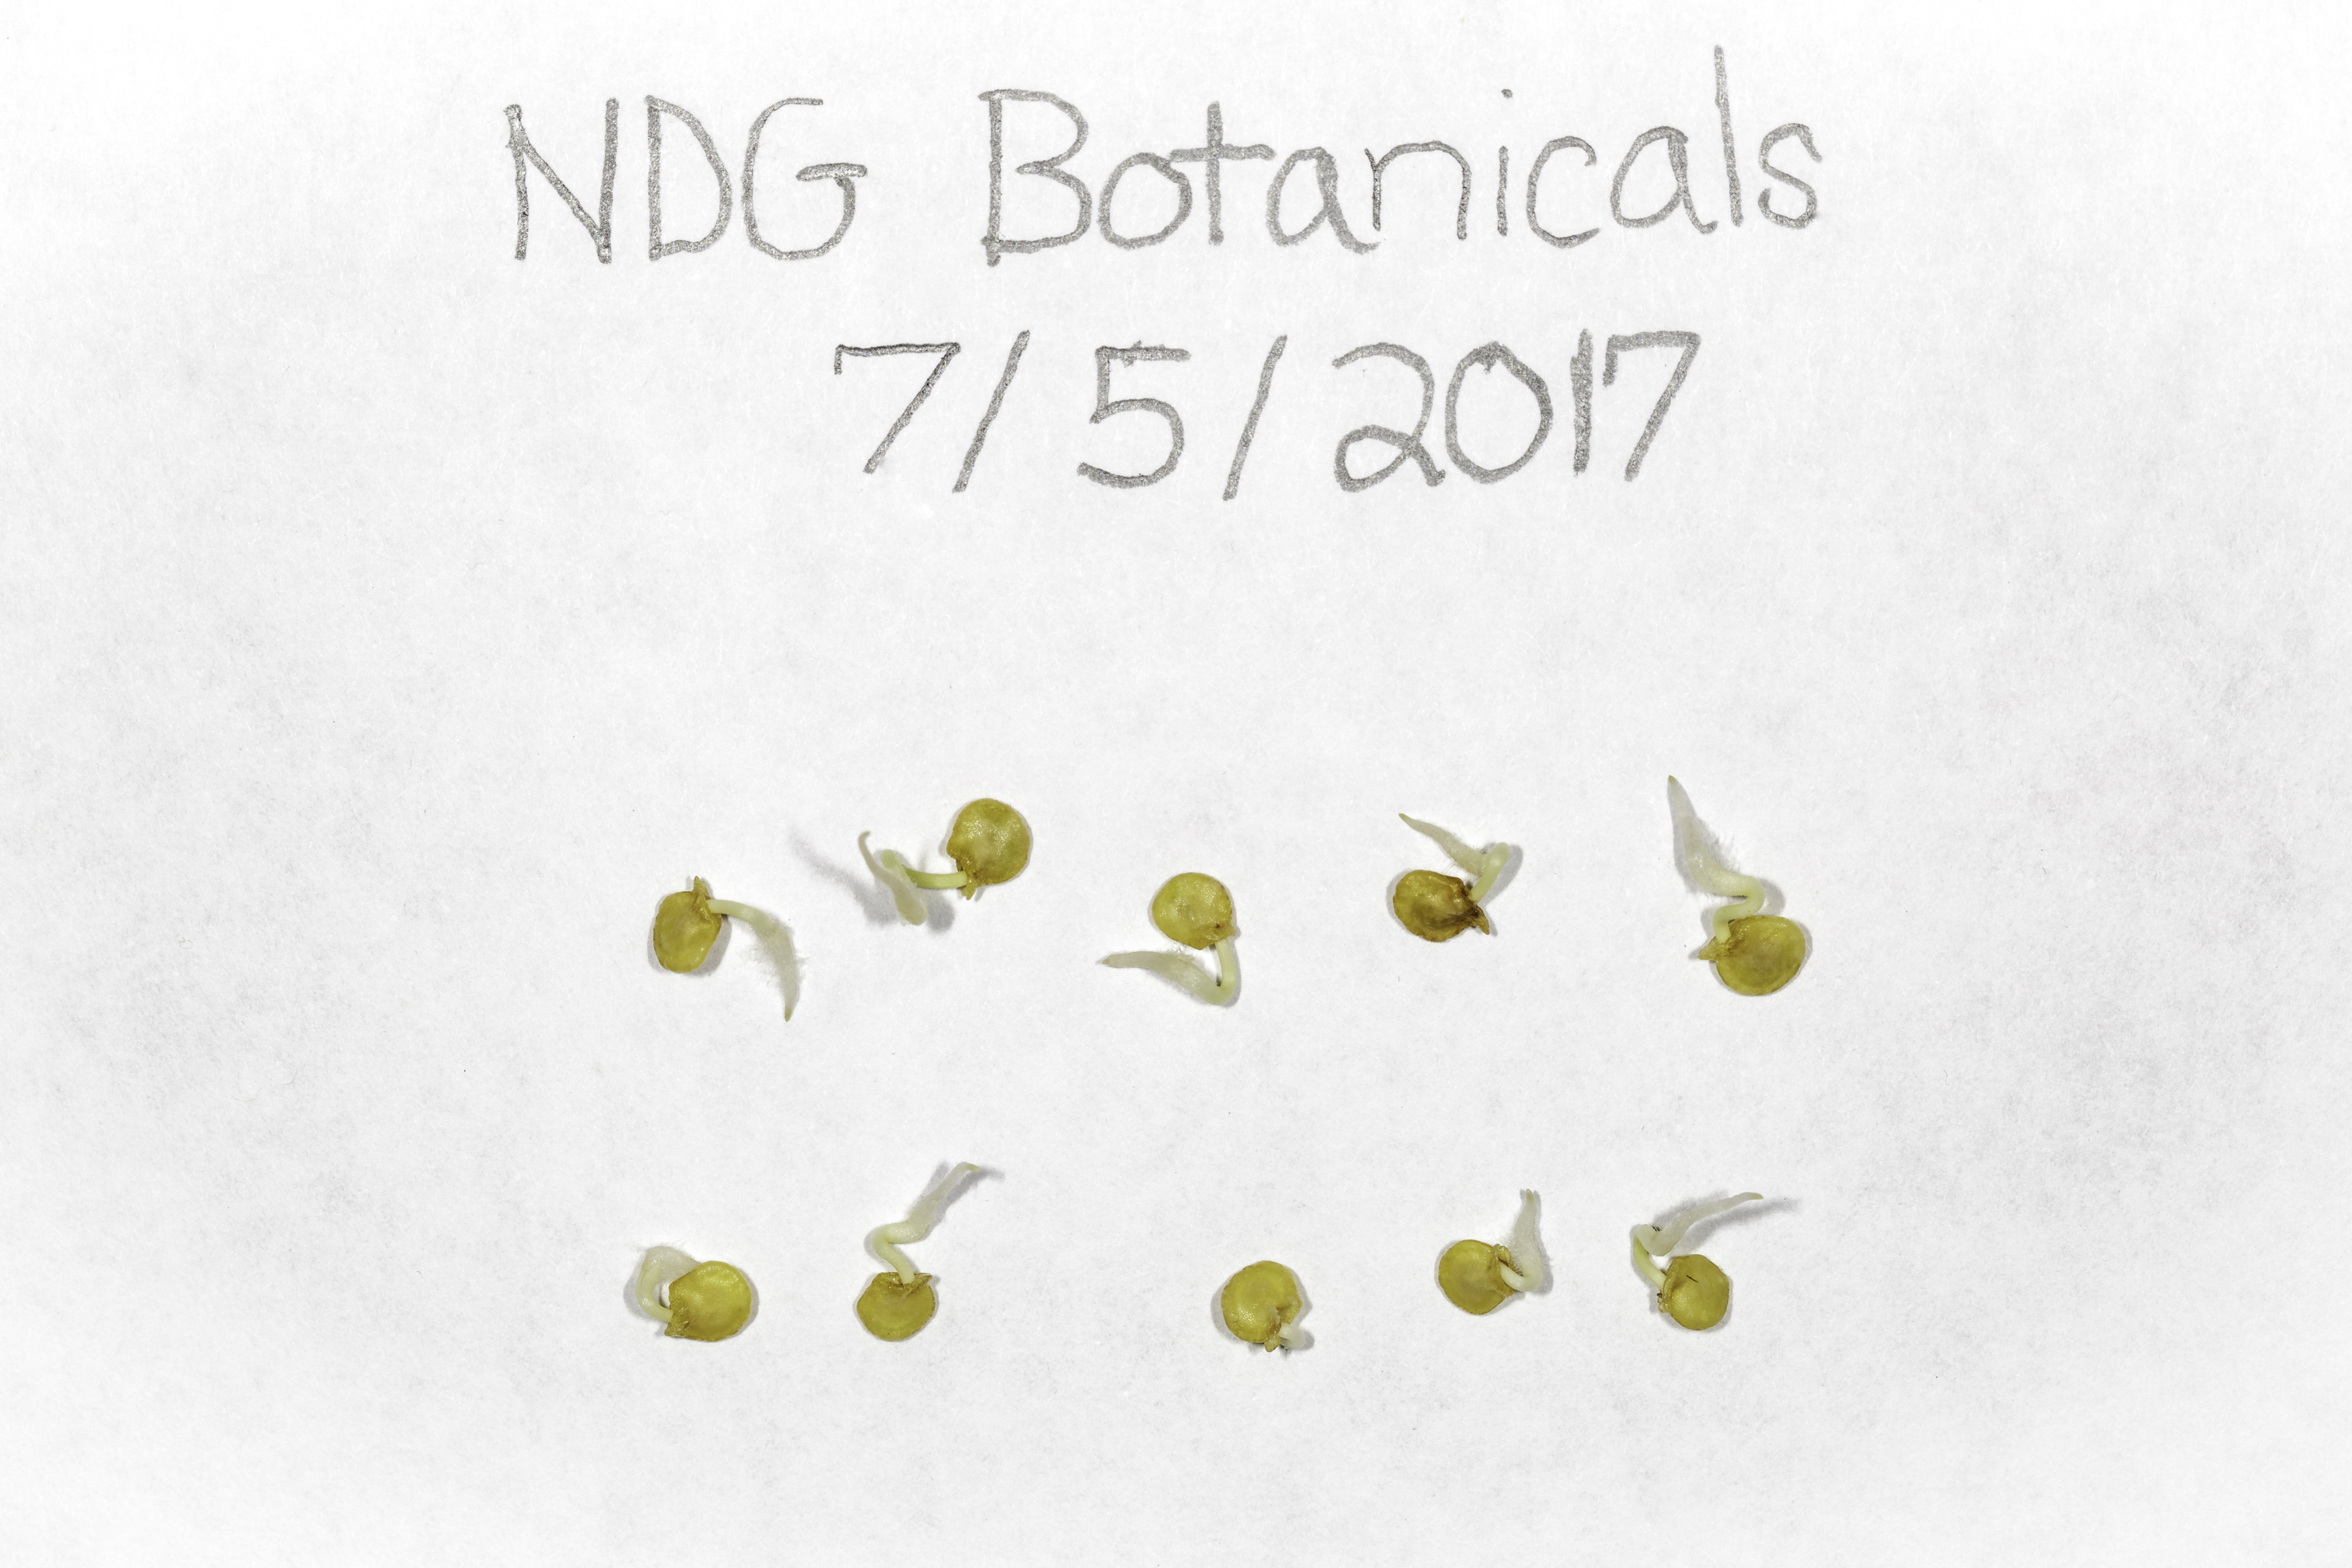 A macro photograph of ten Scotch Bonnet pepper seeds that have begun to germinate.